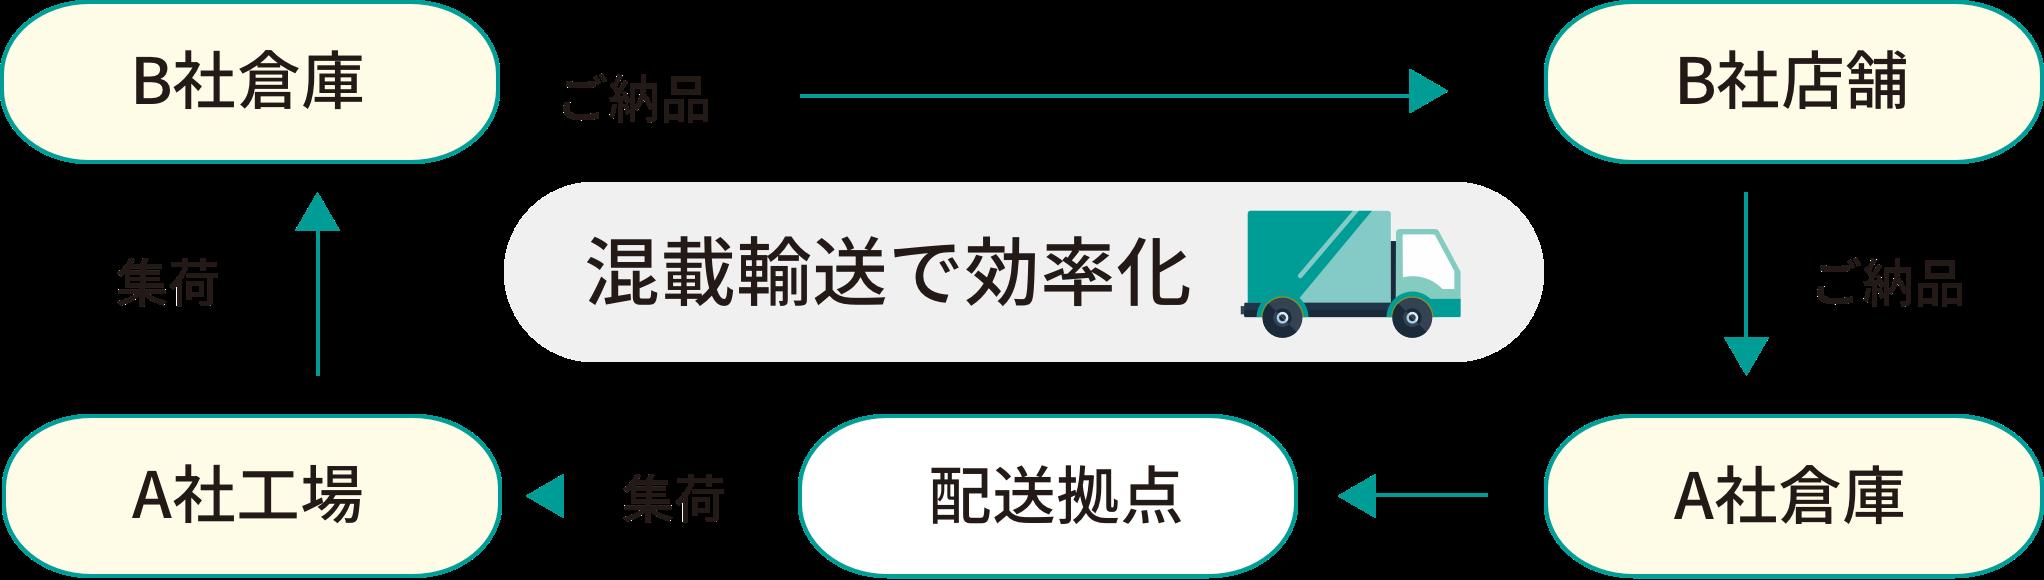 B社倉庫 ご納品 B社店舗 ご納品 A社倉庫 配送拠点 集荷 A社工場 集荷 混戦輸送で効率化